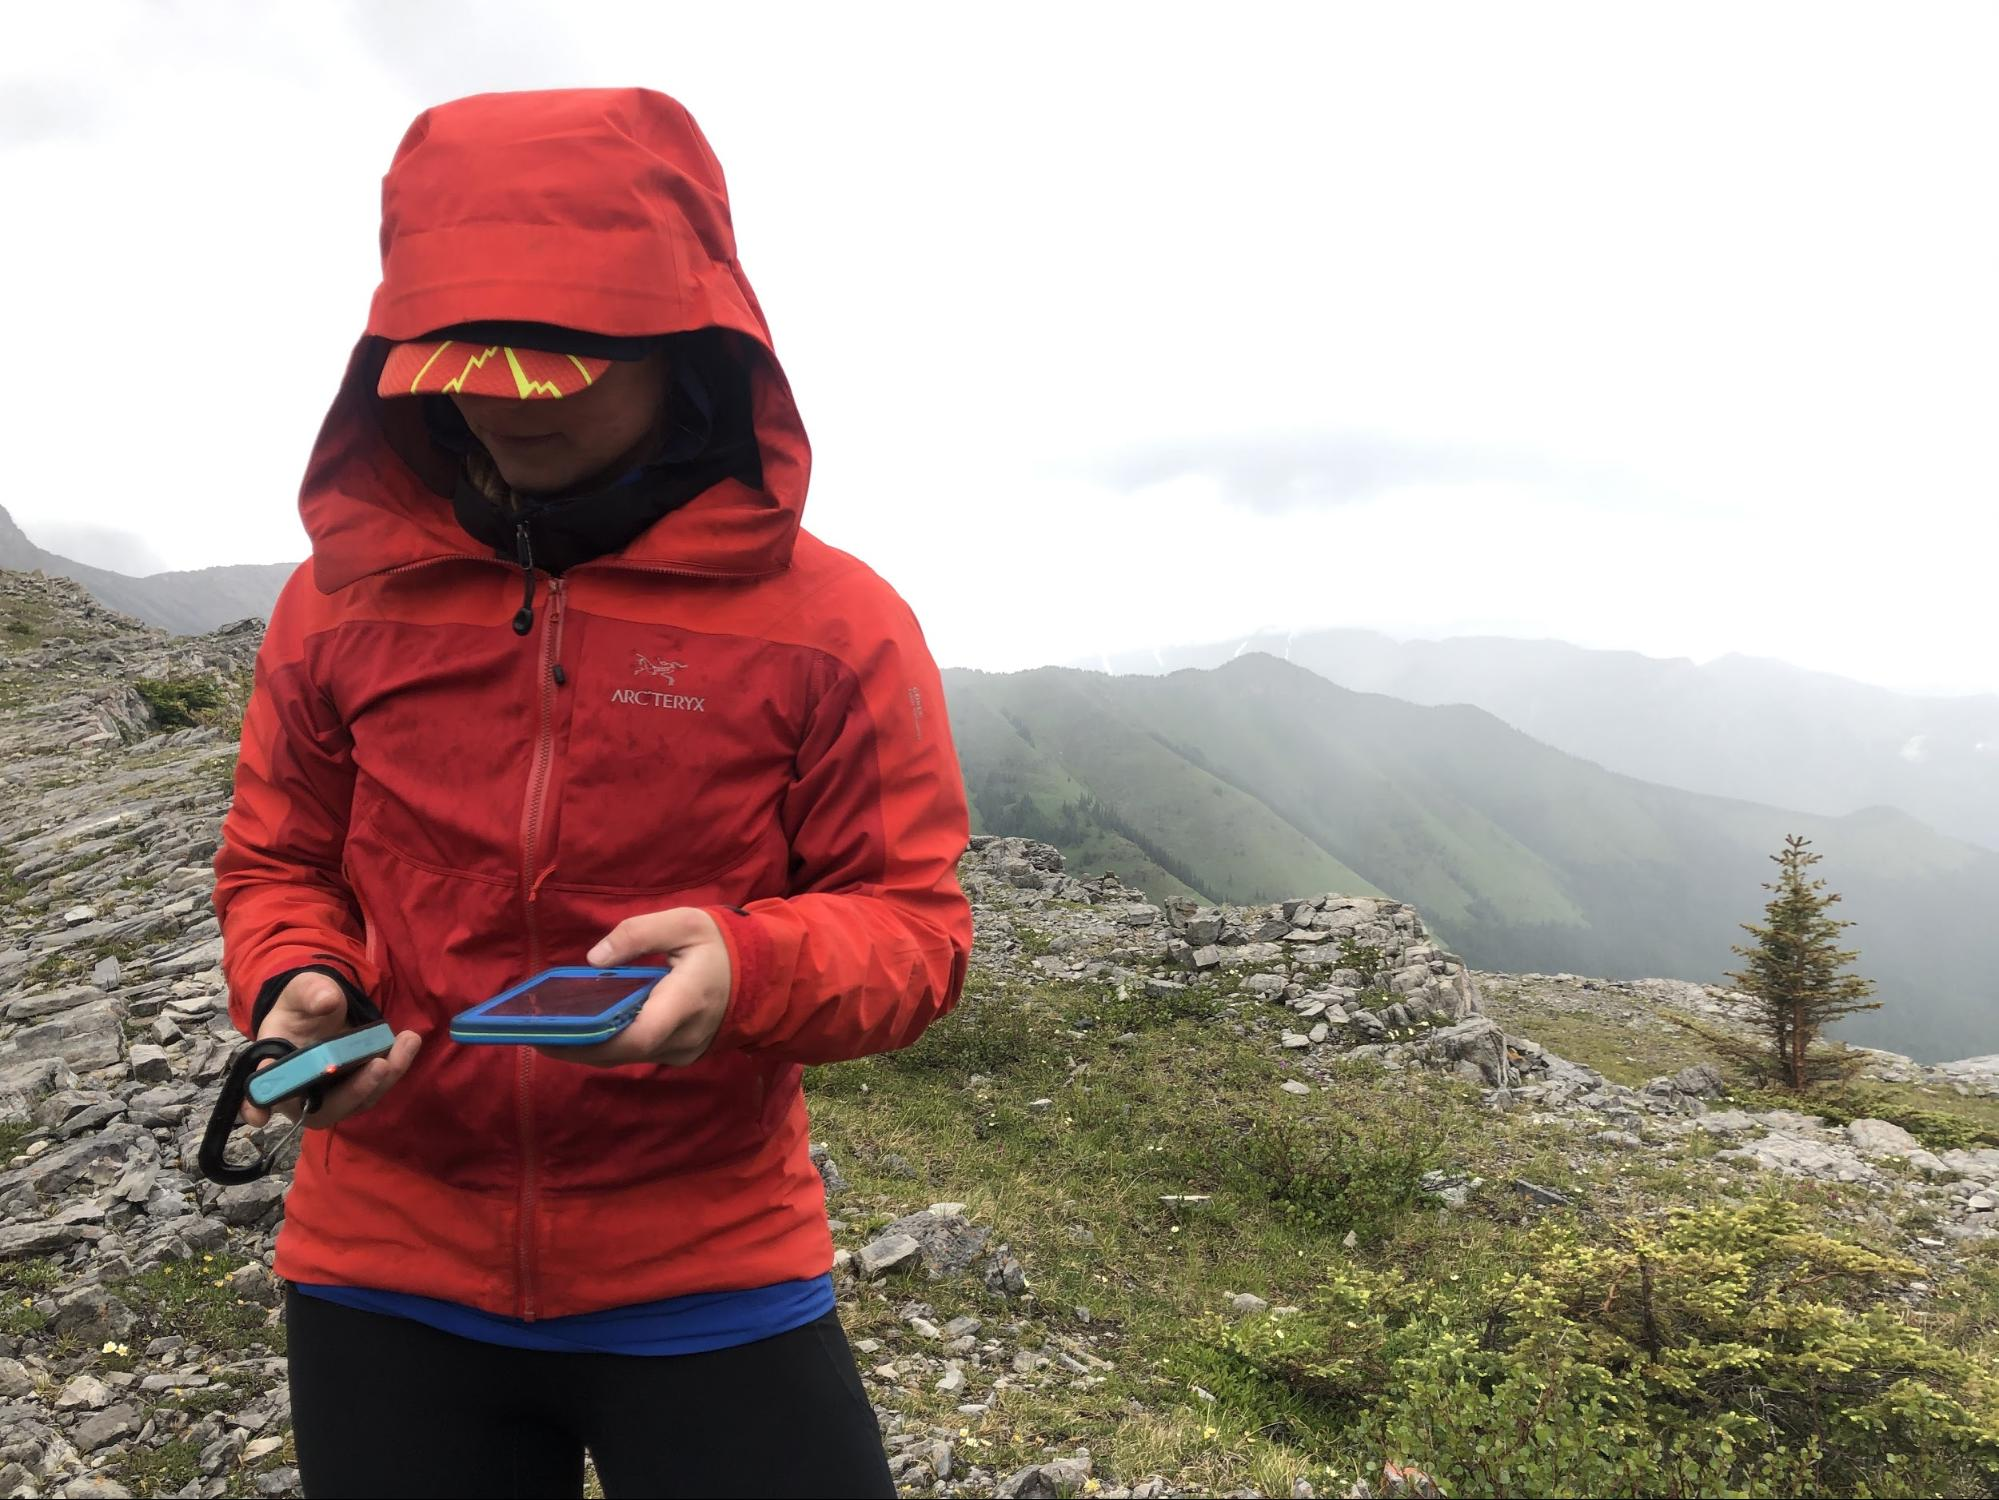 Bivy Stick Blue Satellite Communicator Device for Backcountry Travel